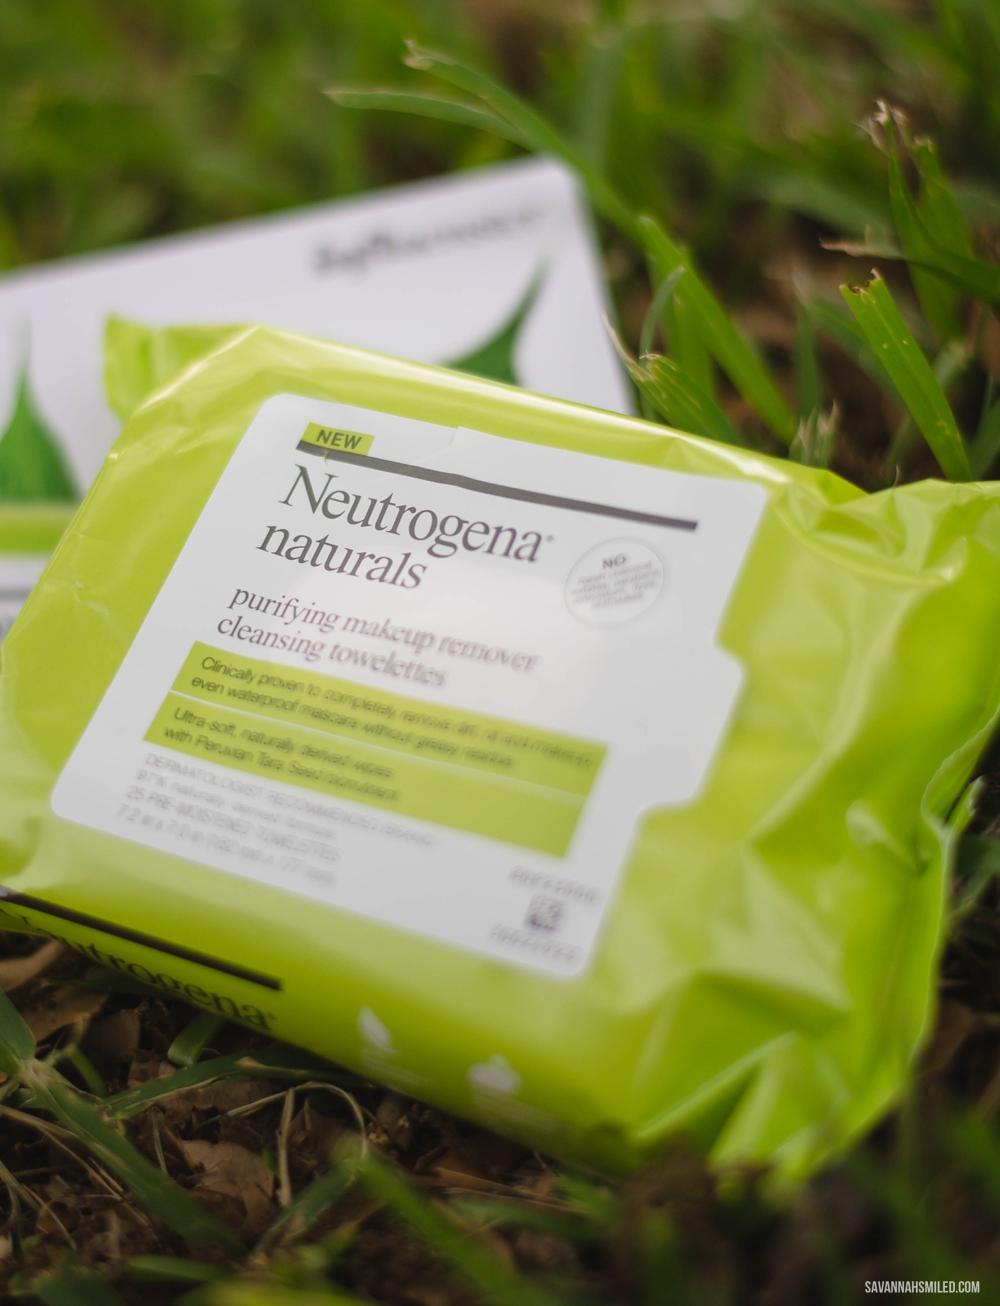 neutrogena-naturals-makeup-remover-3.jpg